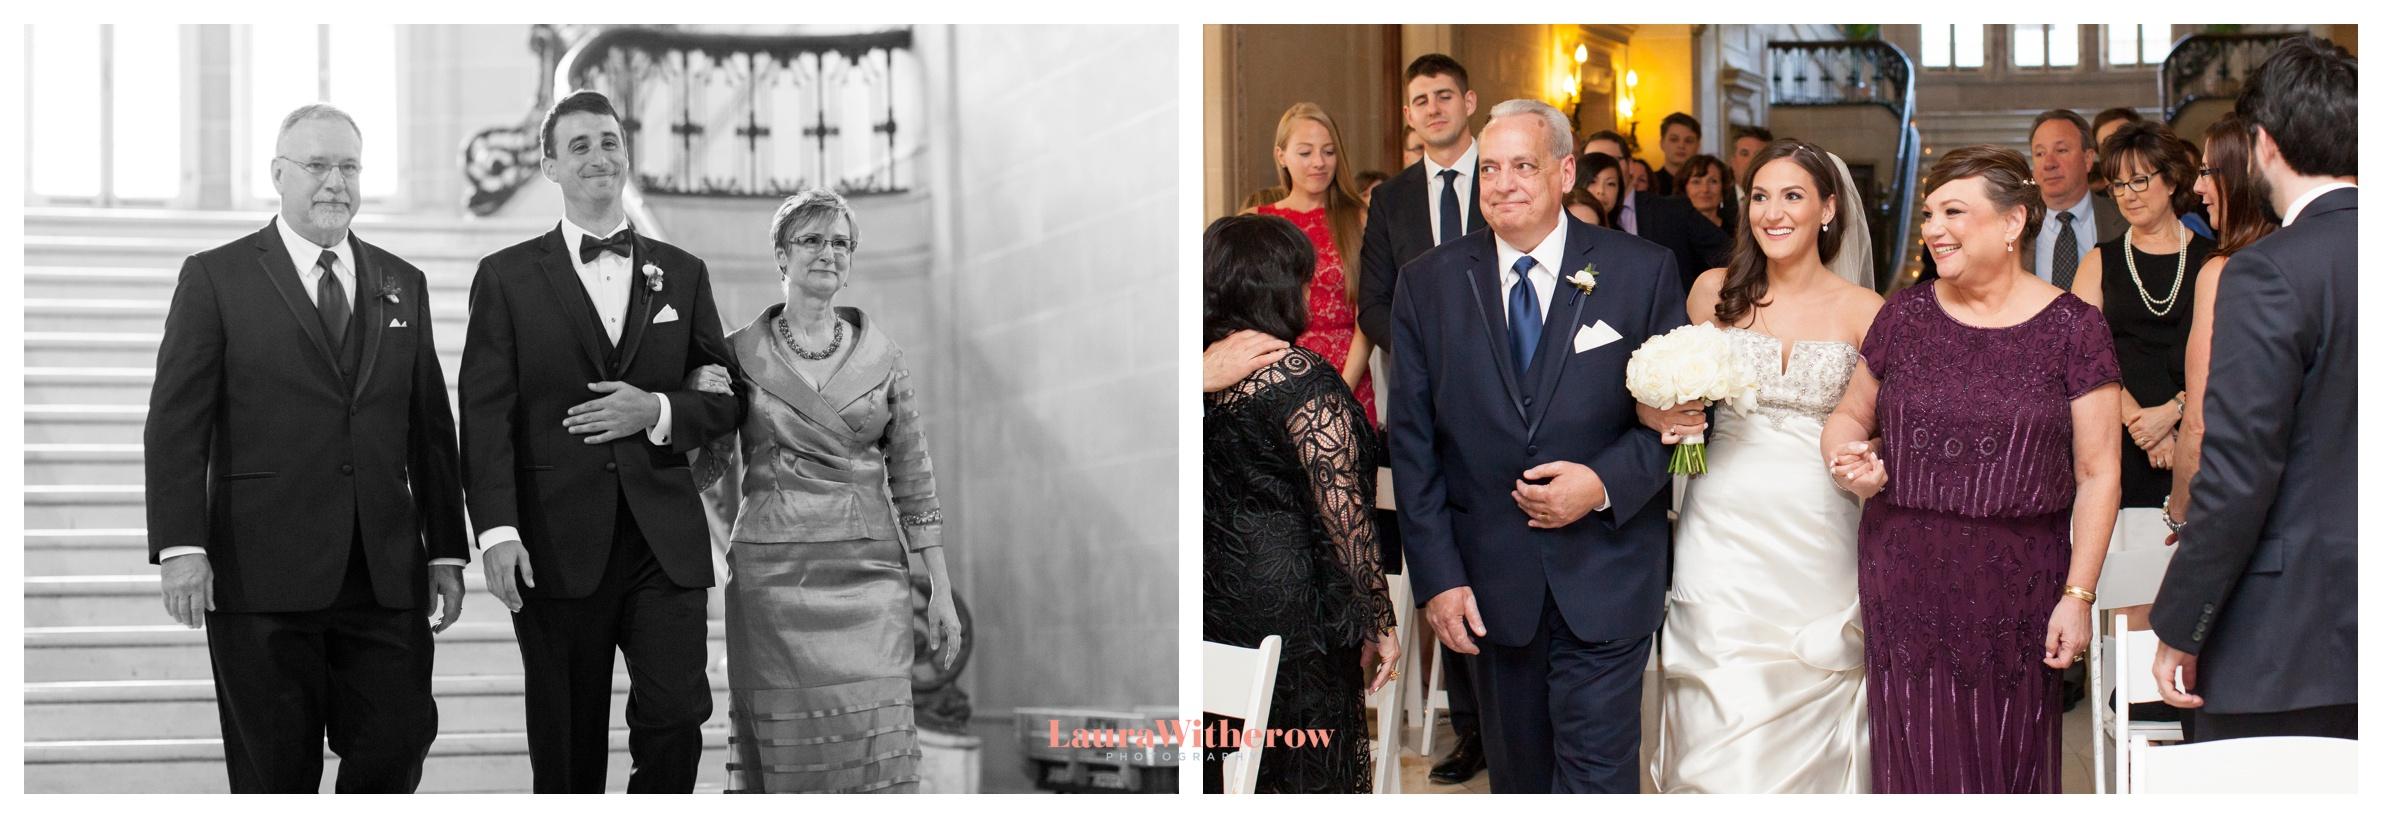 ceremony-armour-house-wedding-photographer